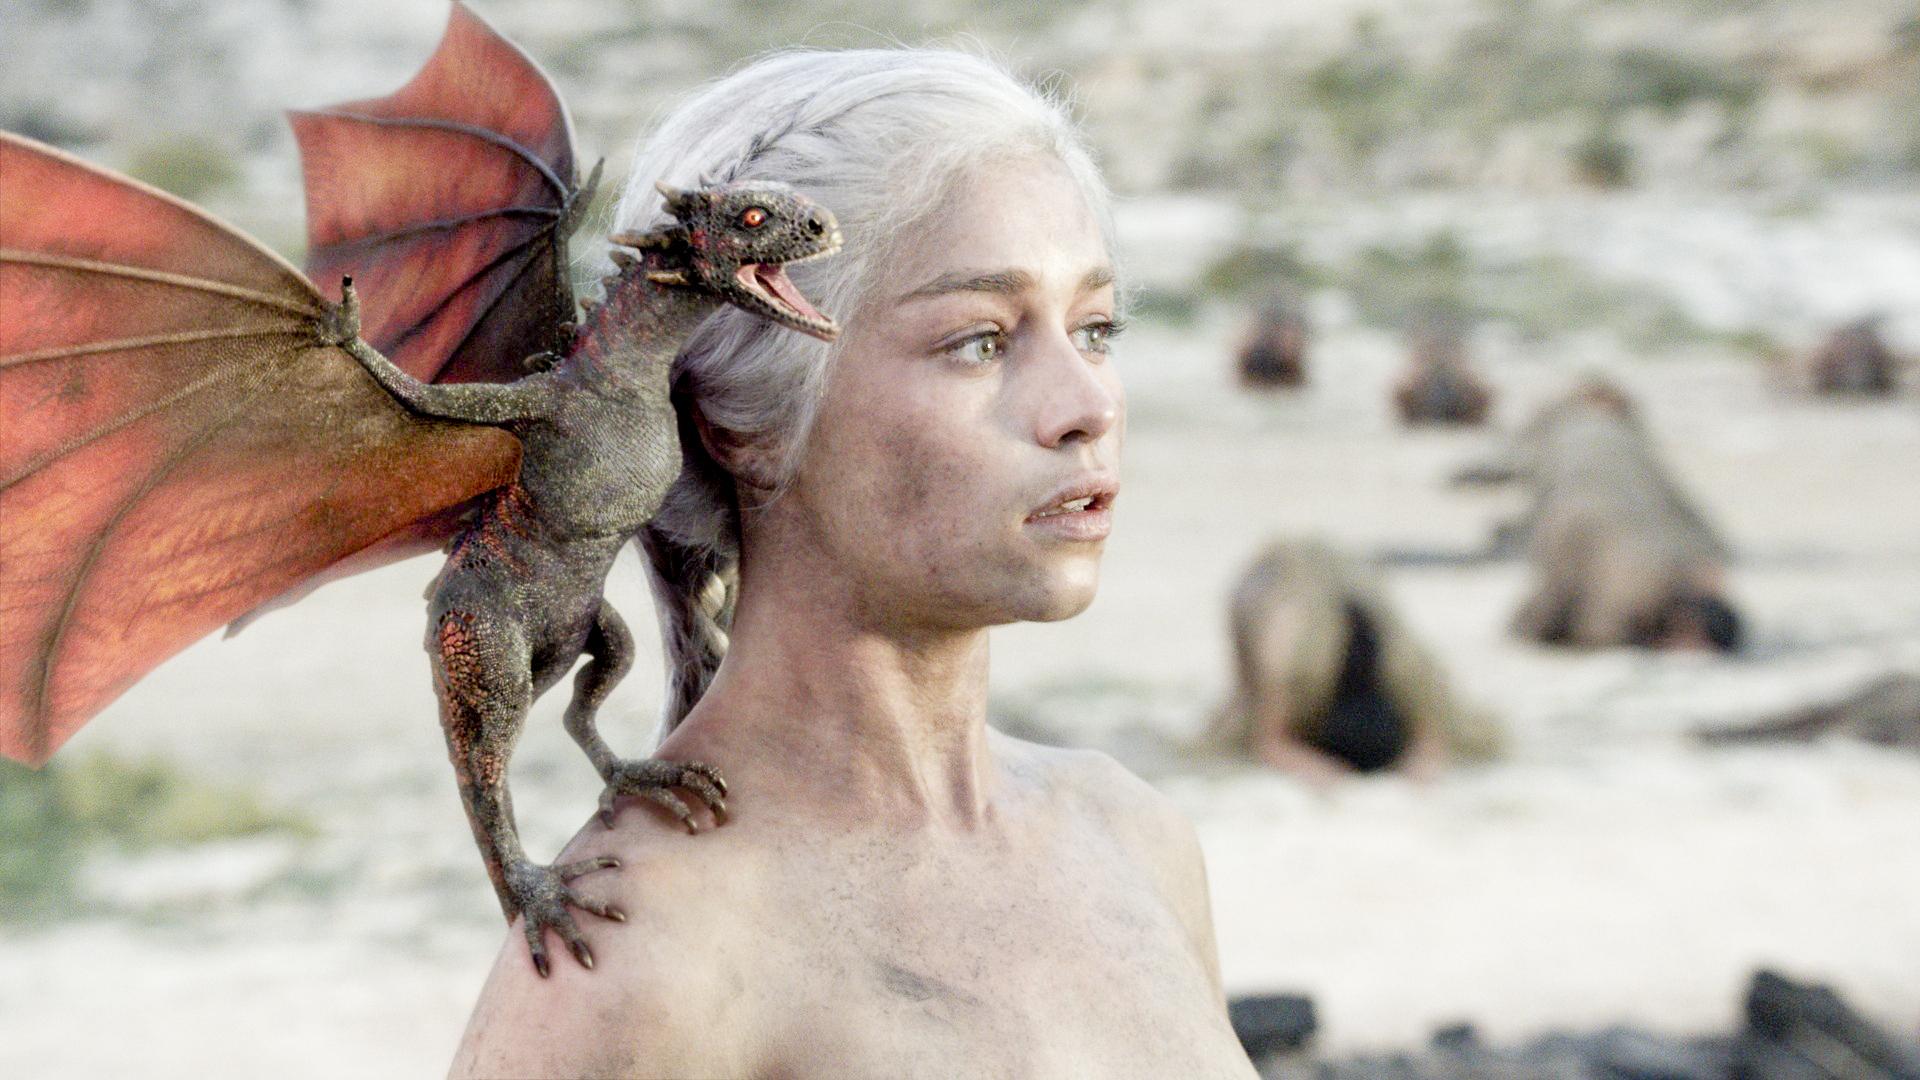 Pressure Emilia Clarke faced to do Game of Thrones nude